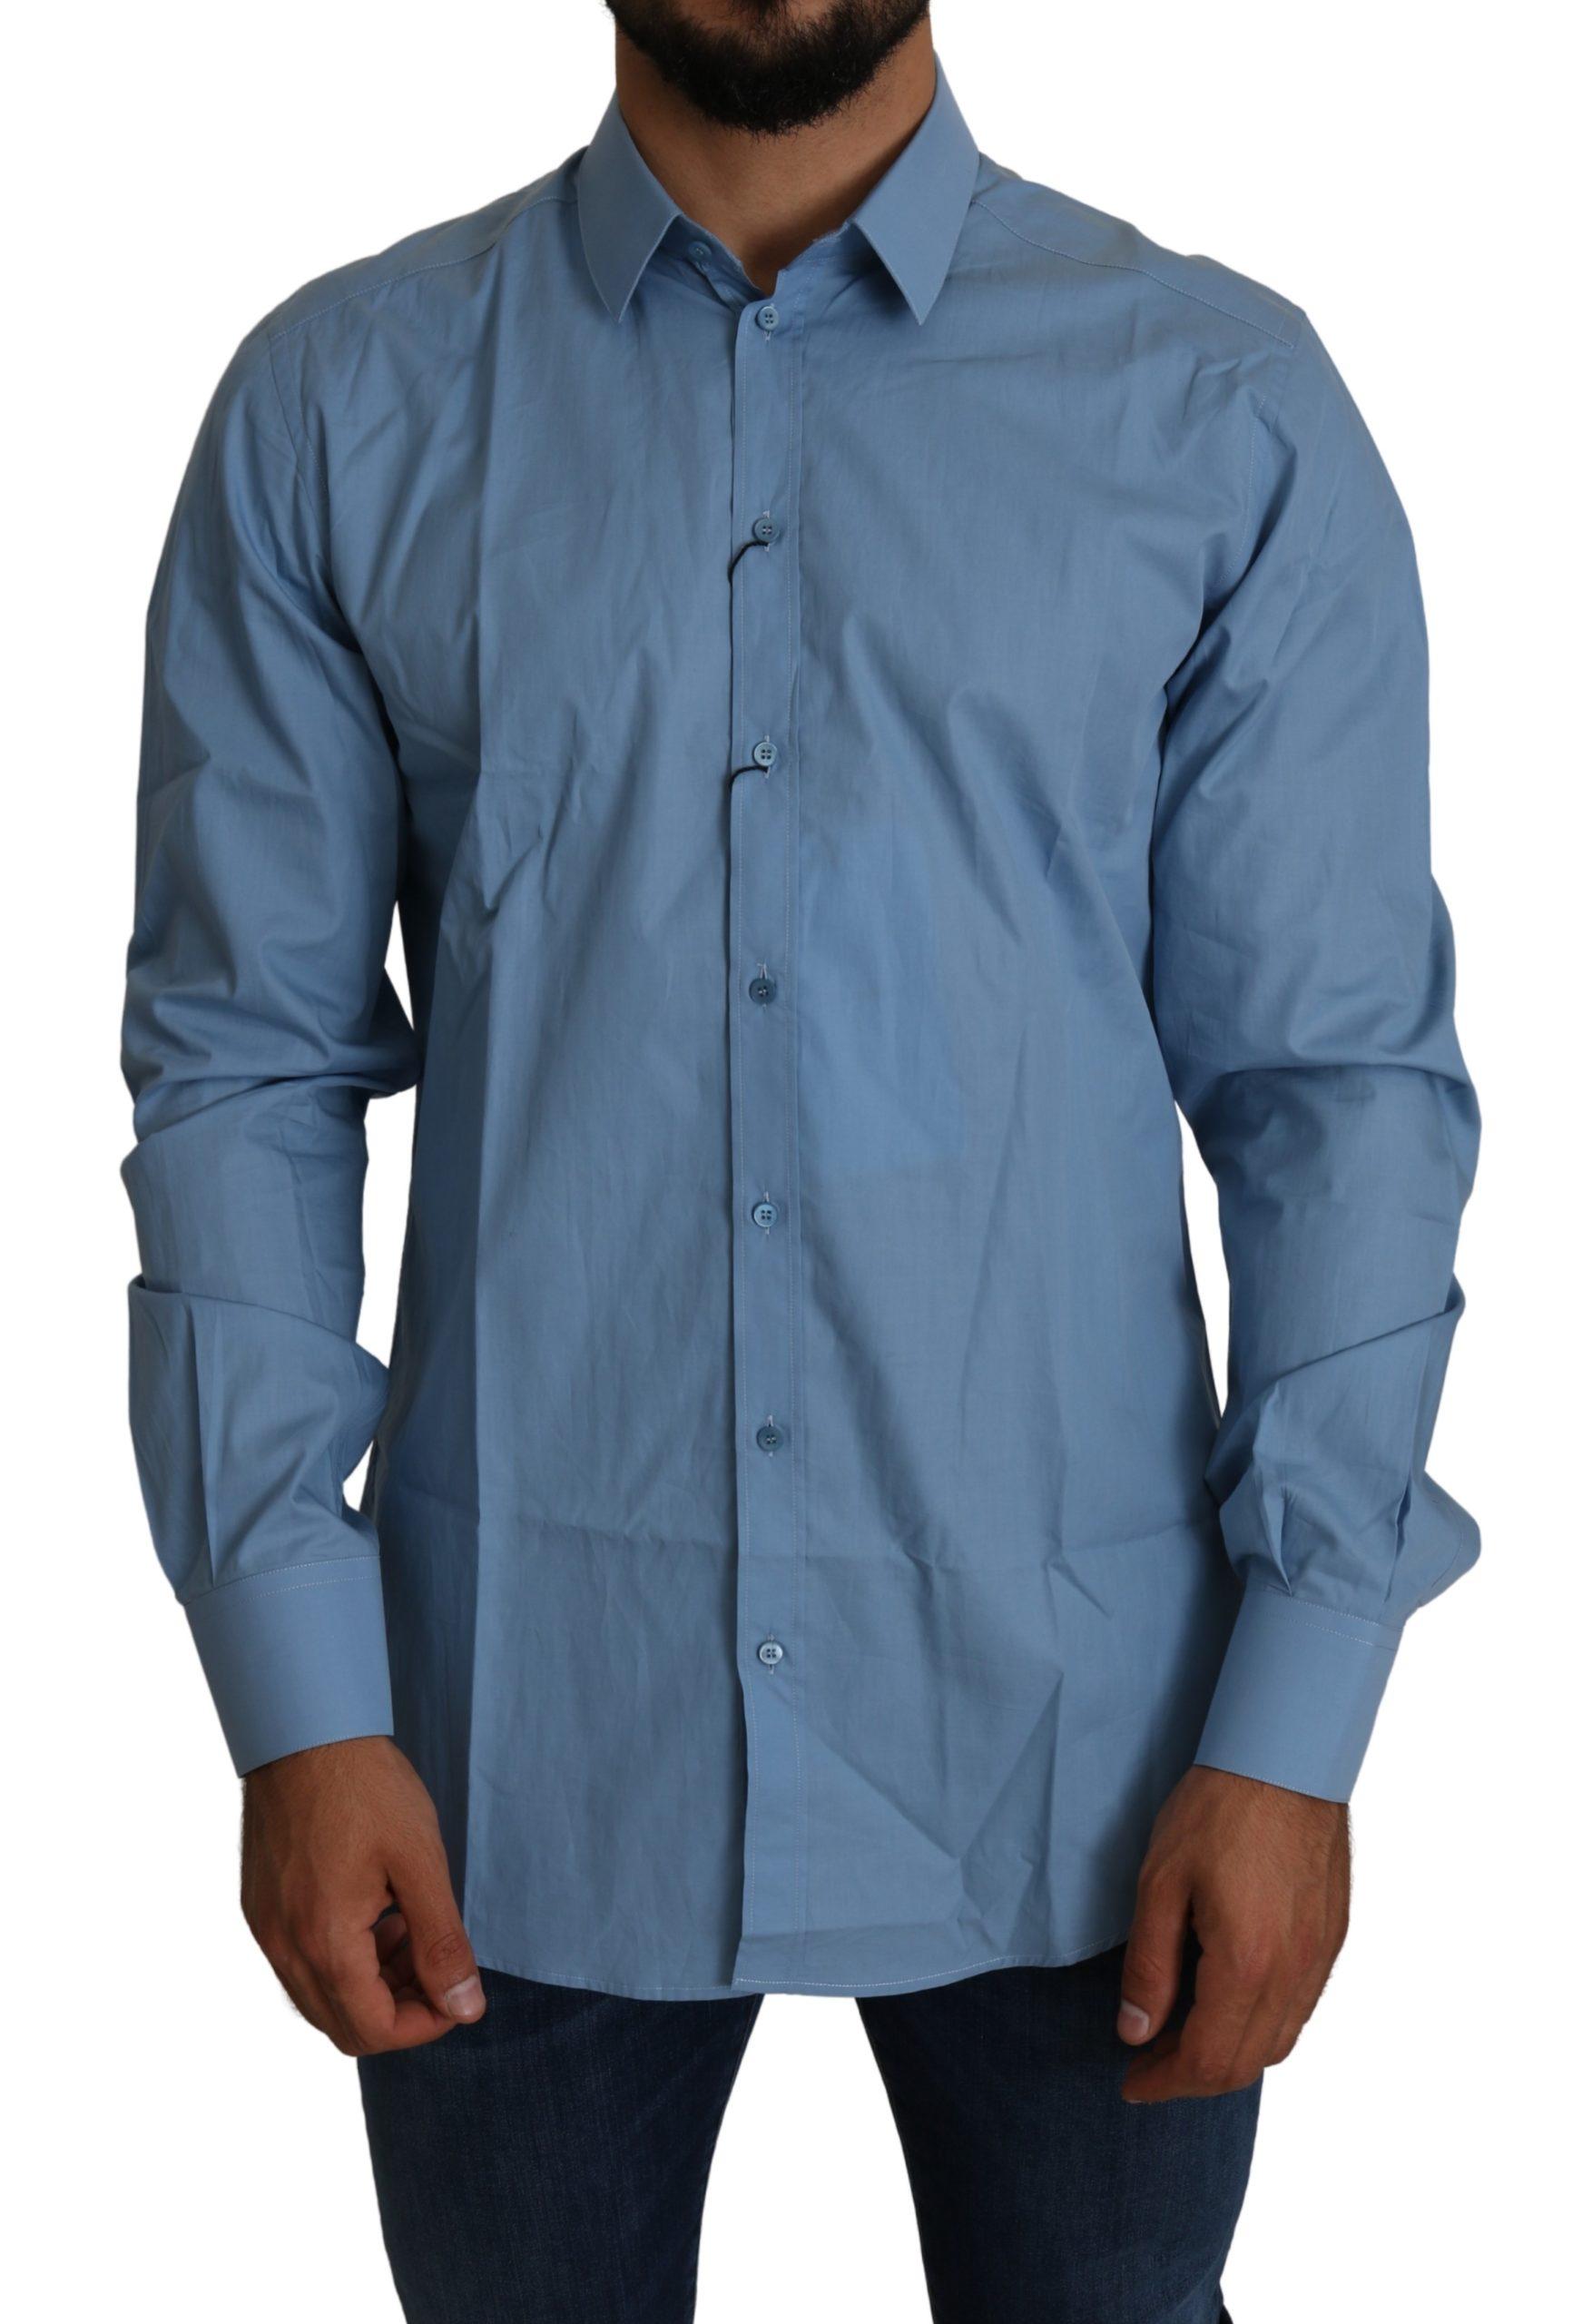 Dolce & Gabbana Men's Formal Cotton Shirt Blue TSH5232 - IT42 | XL